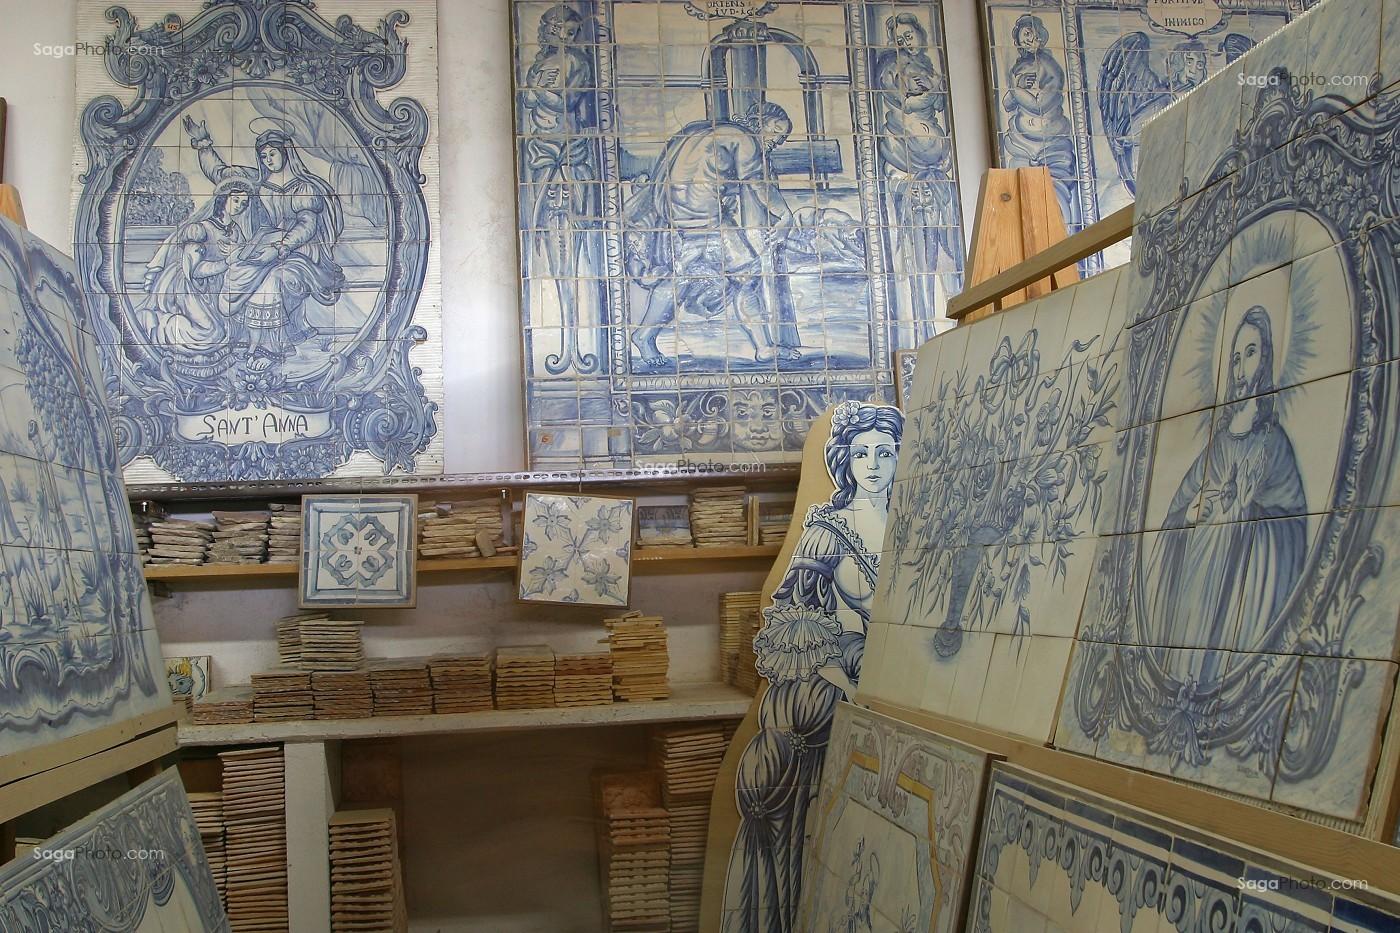 photo de fabrique d 39 azulejos et vente azulejos anciens. Black Bedroom Furniture Sets. Home Design Ideas